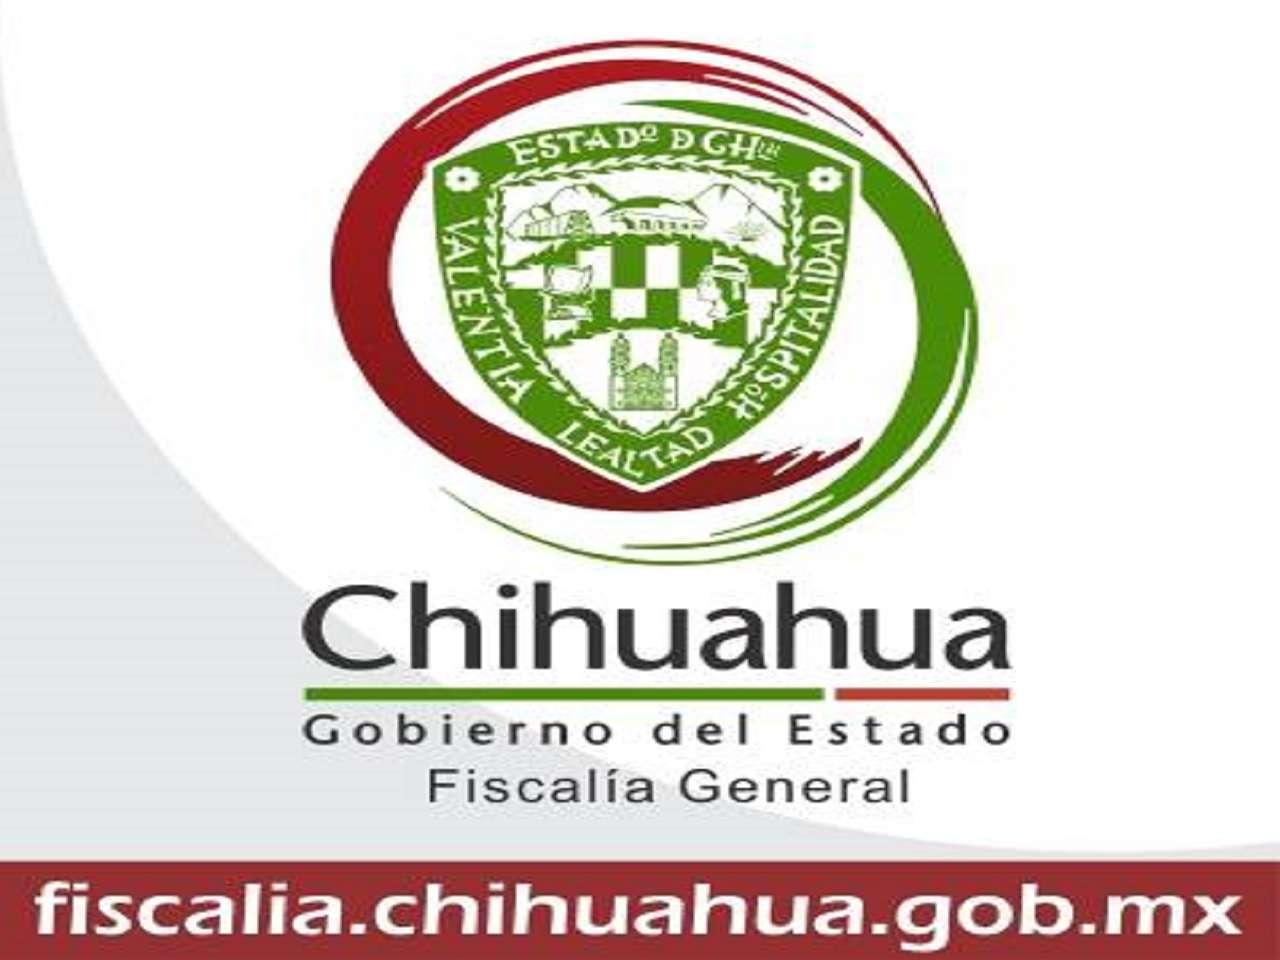 http://fiscalia.chihuahua.gob.mx/